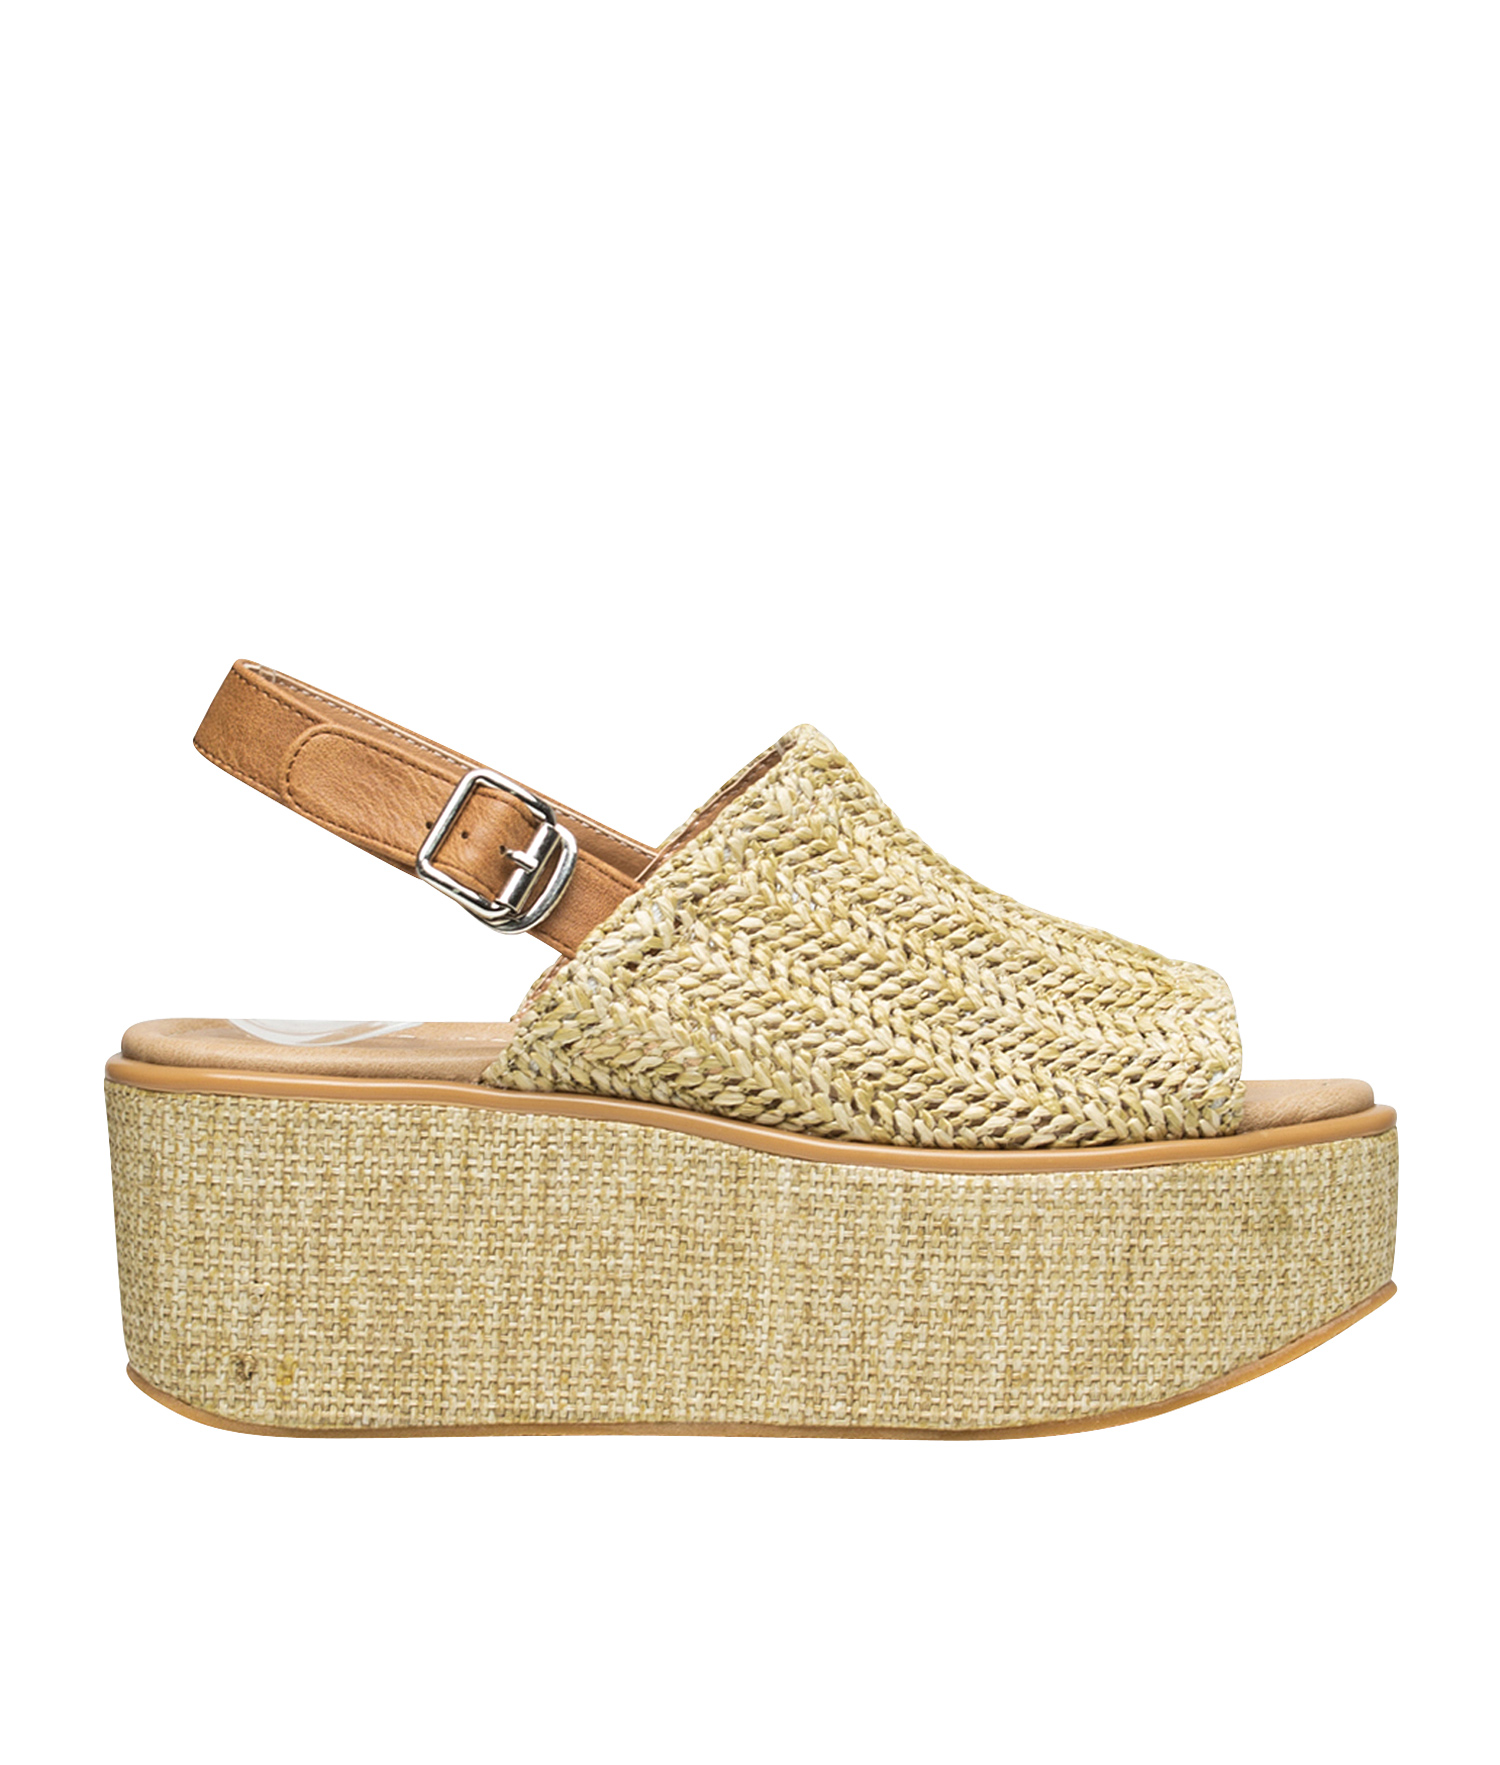 b4885c9afeff AnnaKastle Womens Woven Slingback Platform Sandals Beige